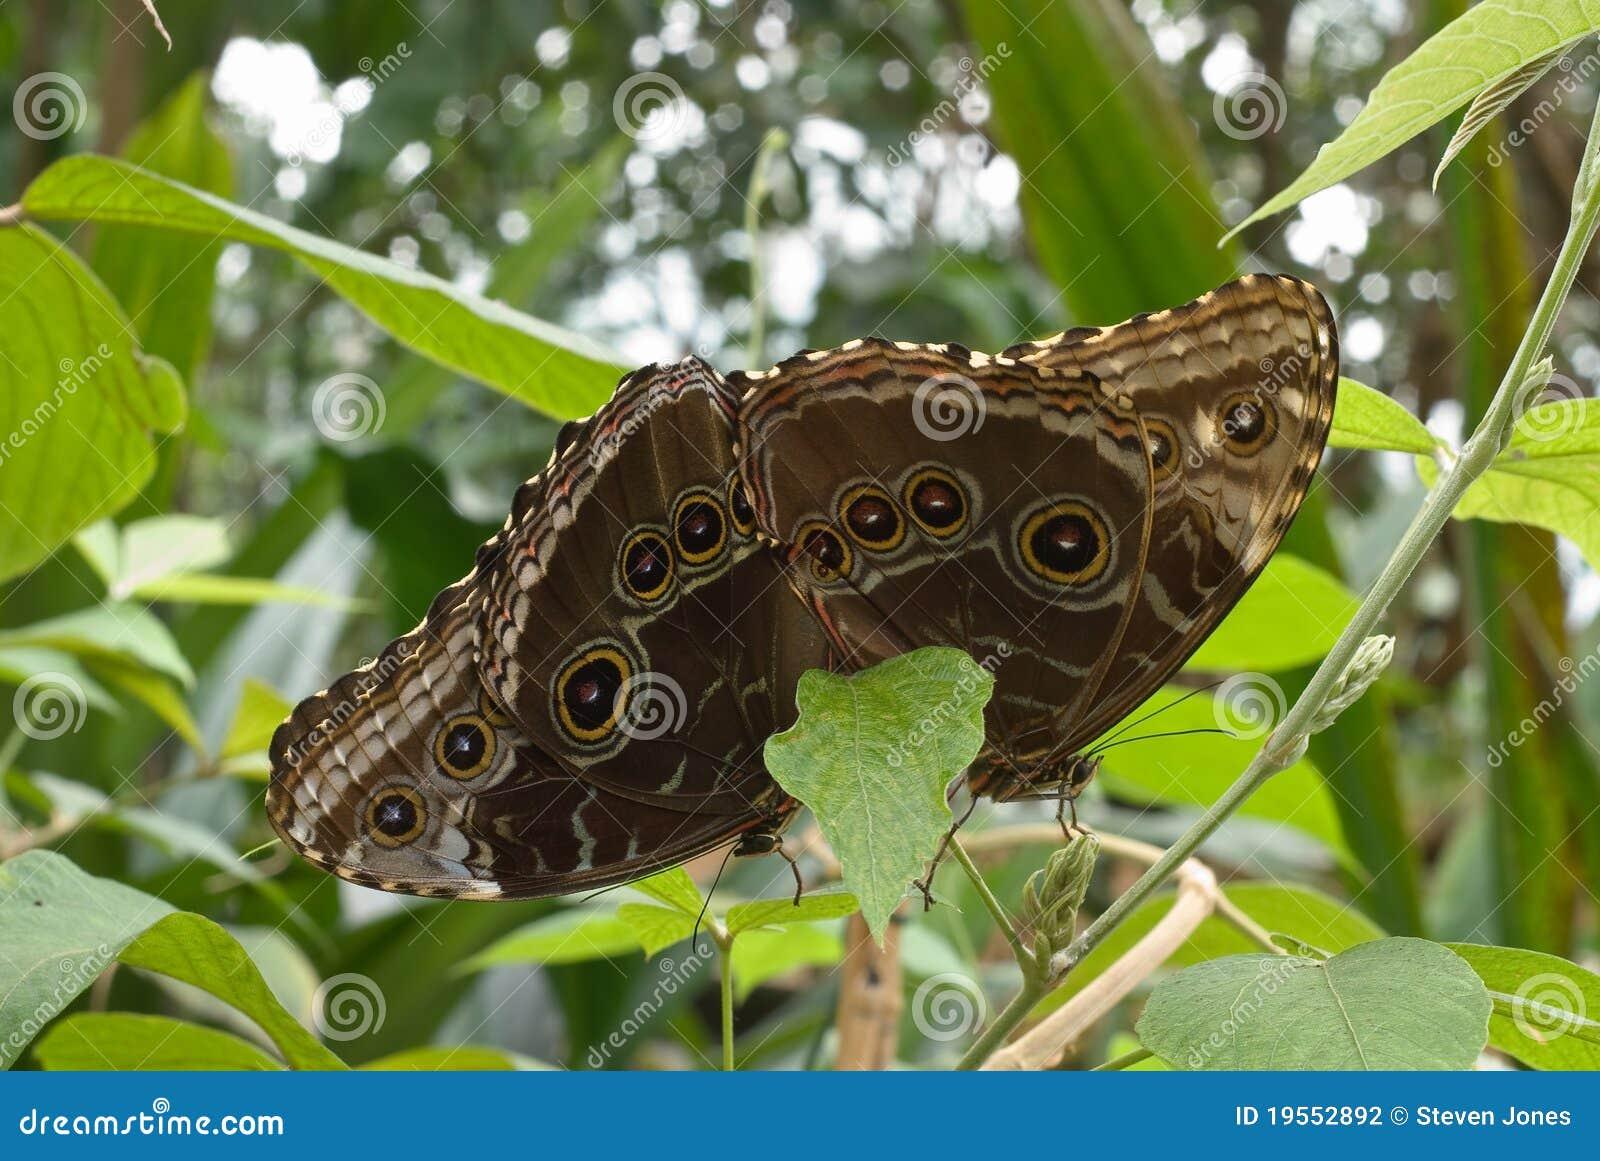 Aphrodite bet at home Bonus zakłady sportowe bet at home drugie konto Fritillary Butterfly Chrysalis